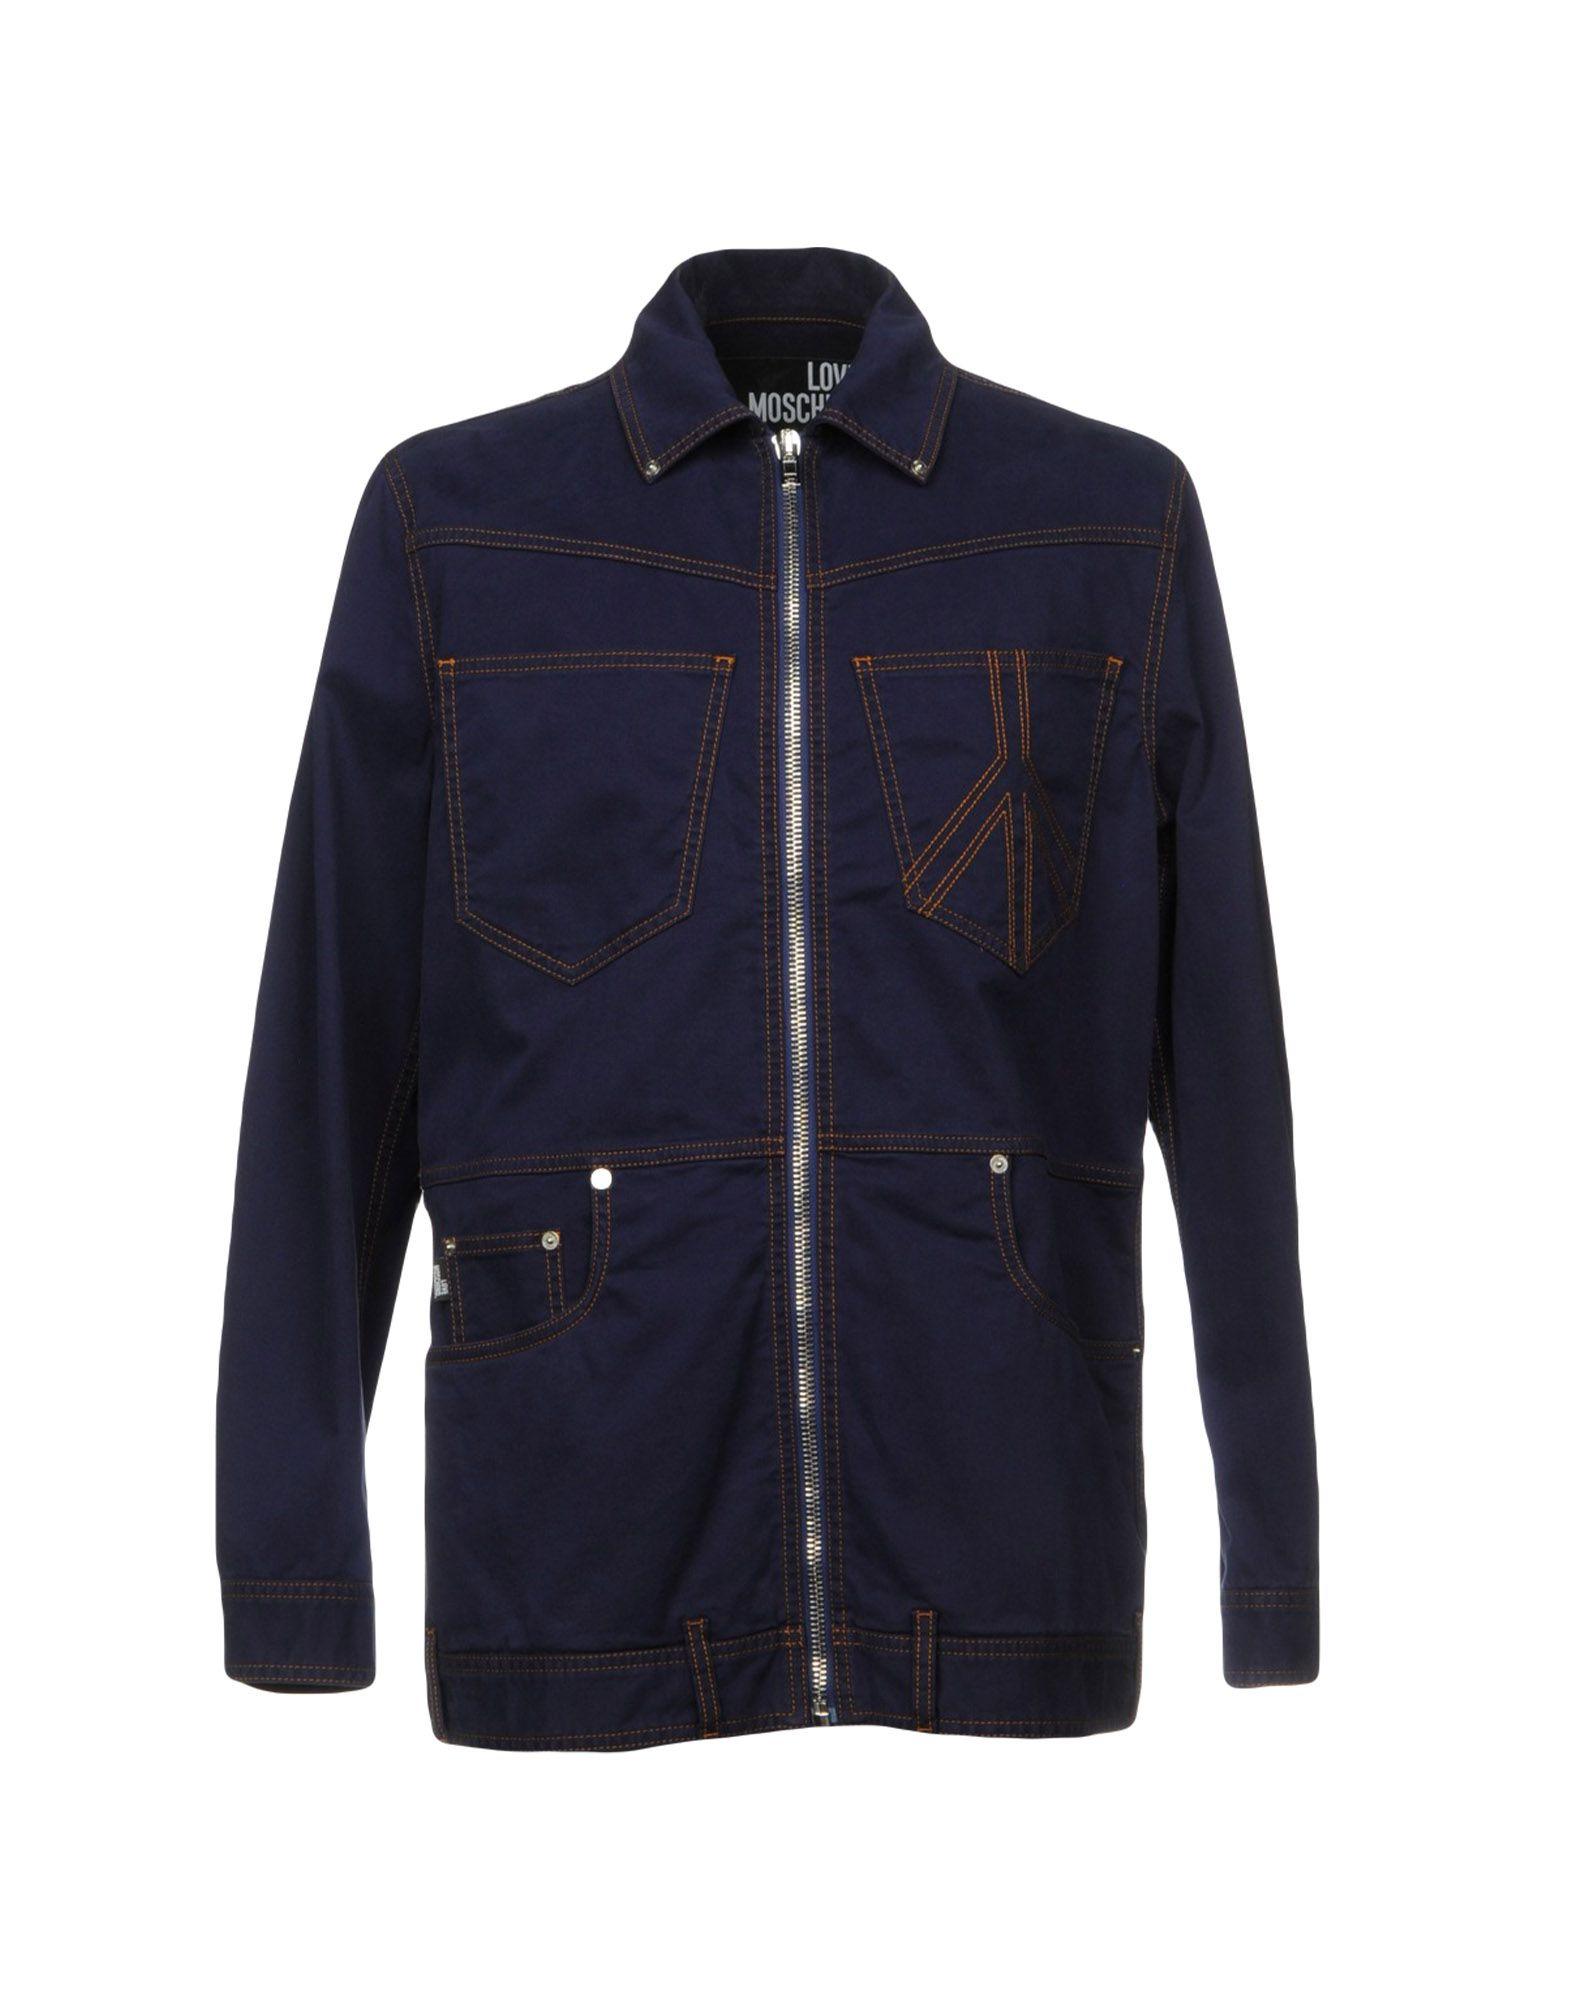 ФОТО love moschino куртка